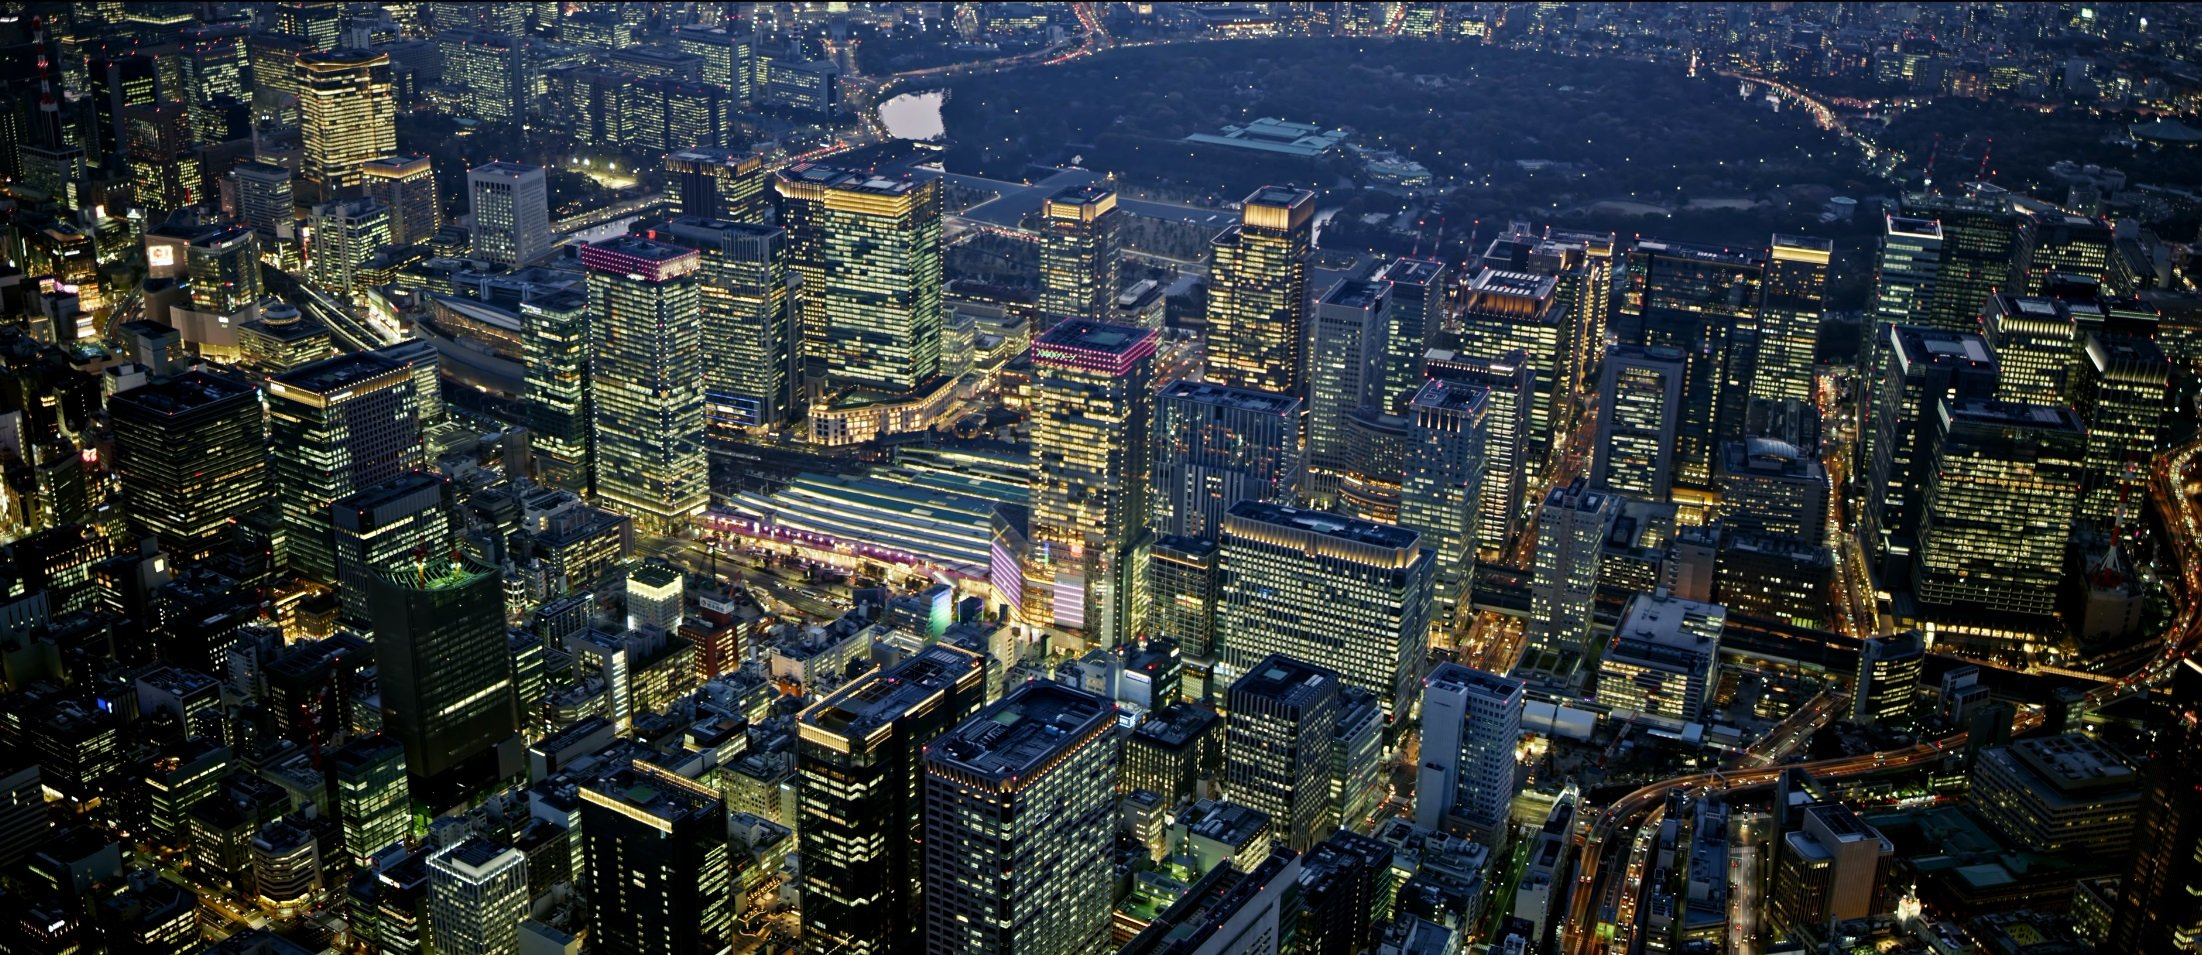 Kjclub ソウルの夜景を8k高画質で撮影した映像が世界で話題に 海外